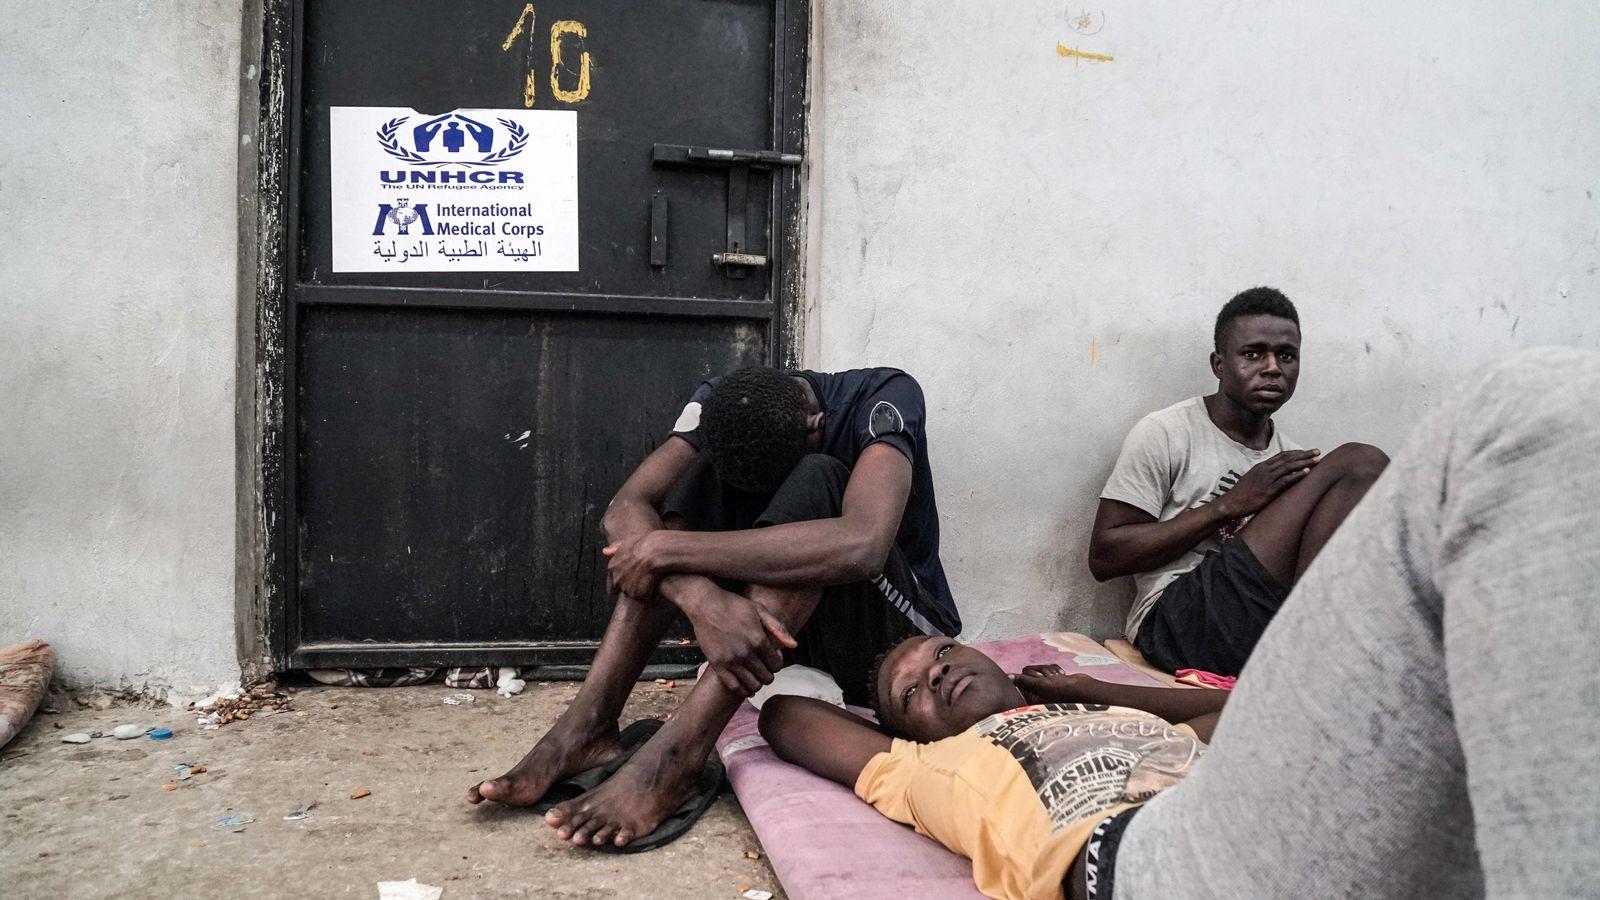 Libyen / Flüchtlinge / Auffanglager